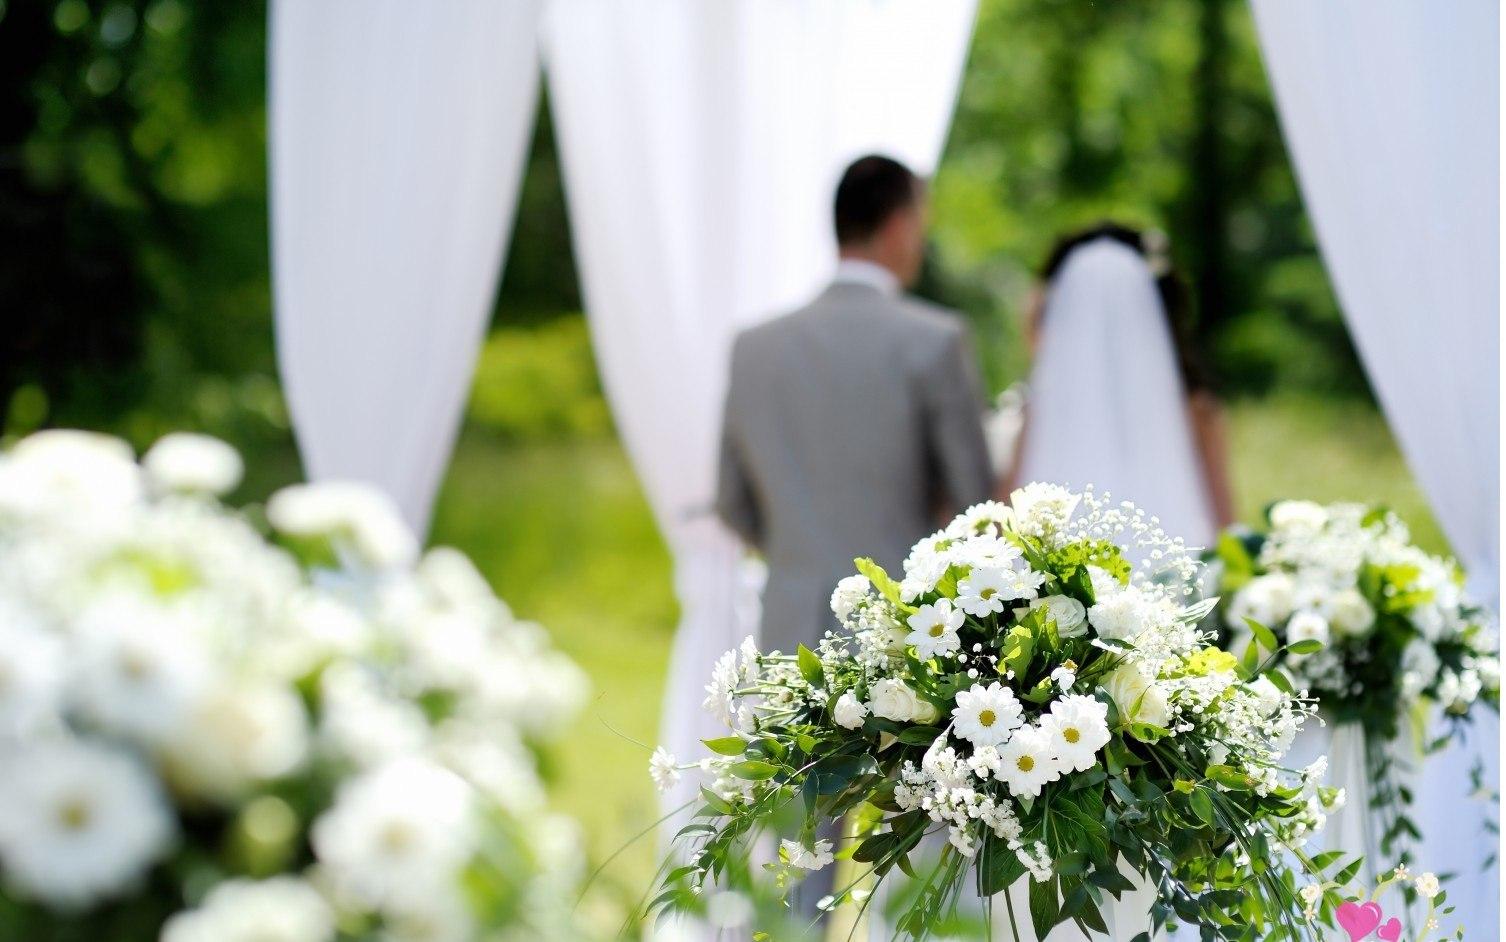 hNwJFVfg1lM - Готовимся к свадьбе: праздник своими руками